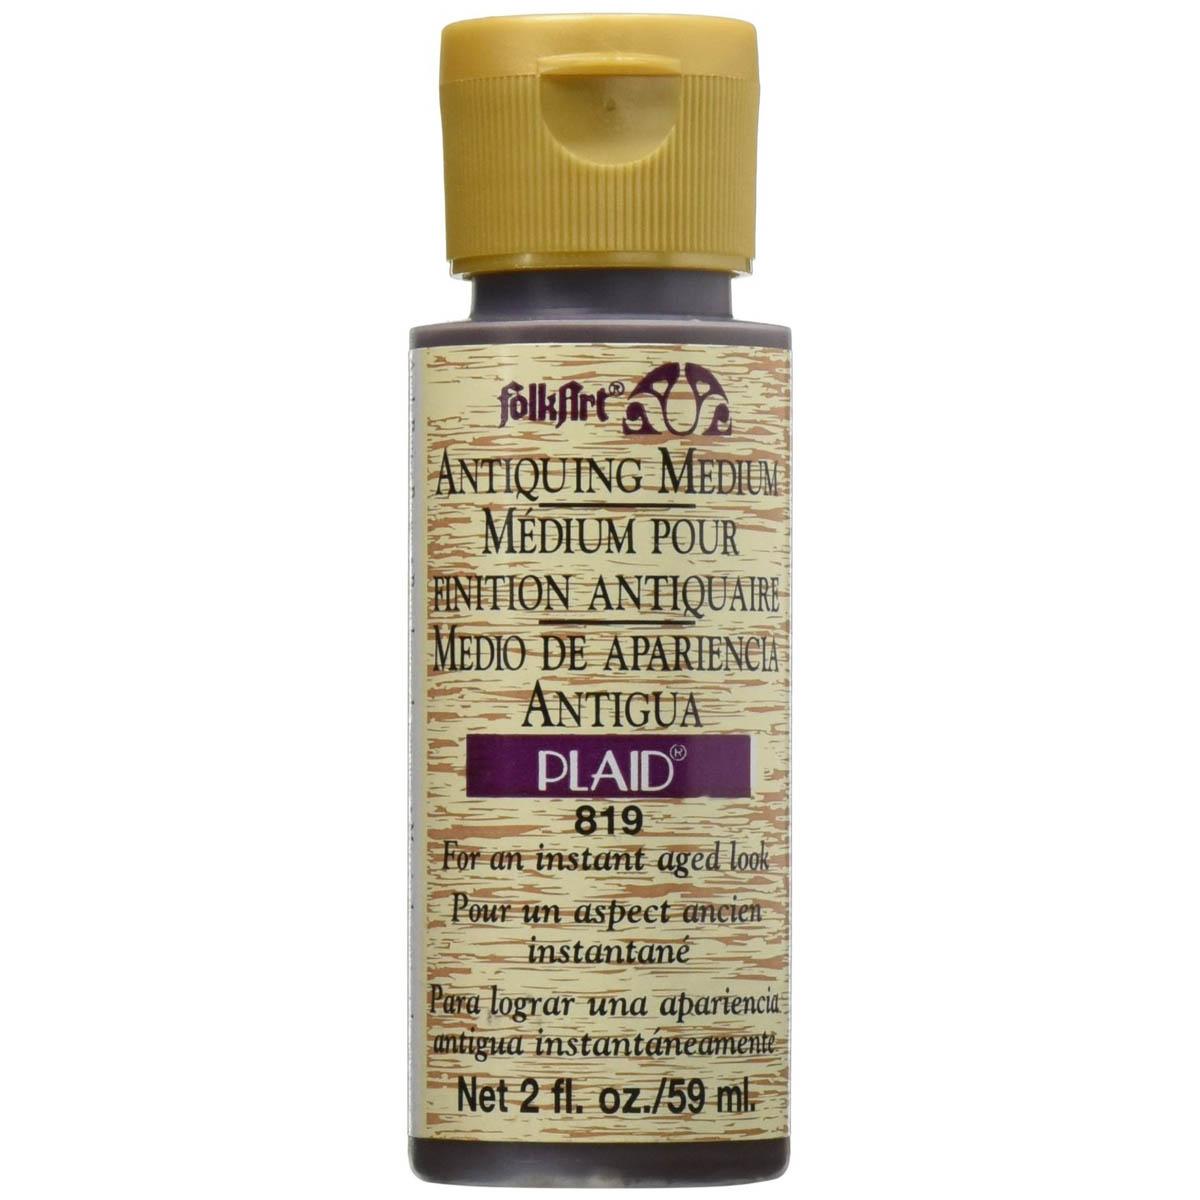 FolkArt ® Mediums - Antiquing Medium - Apple Butter Brown, 2 oz.